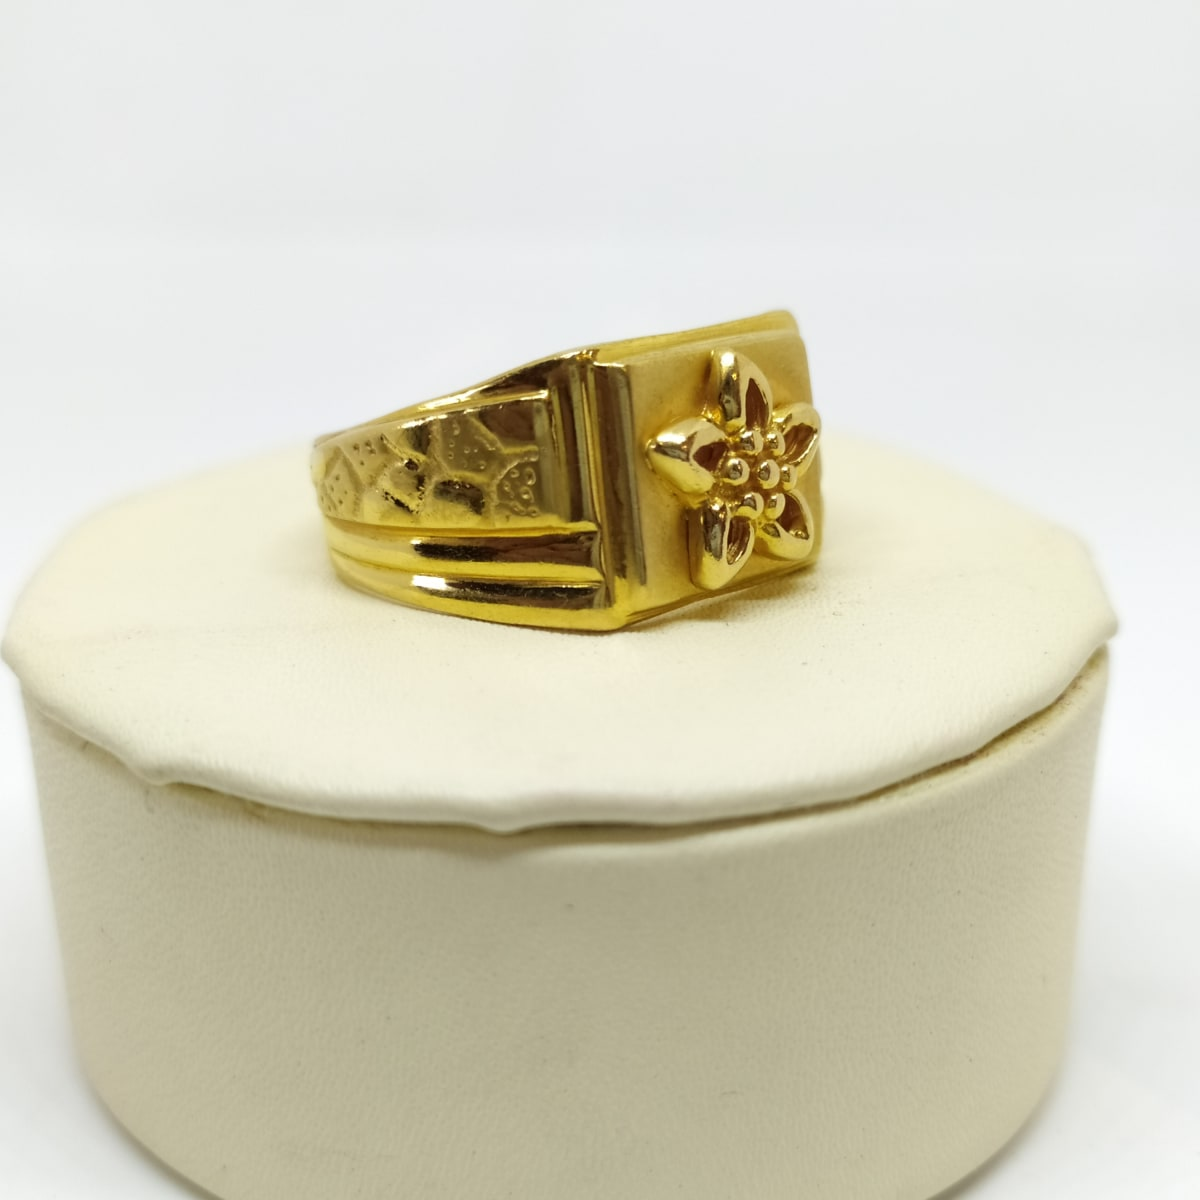 Bhaskar Ring